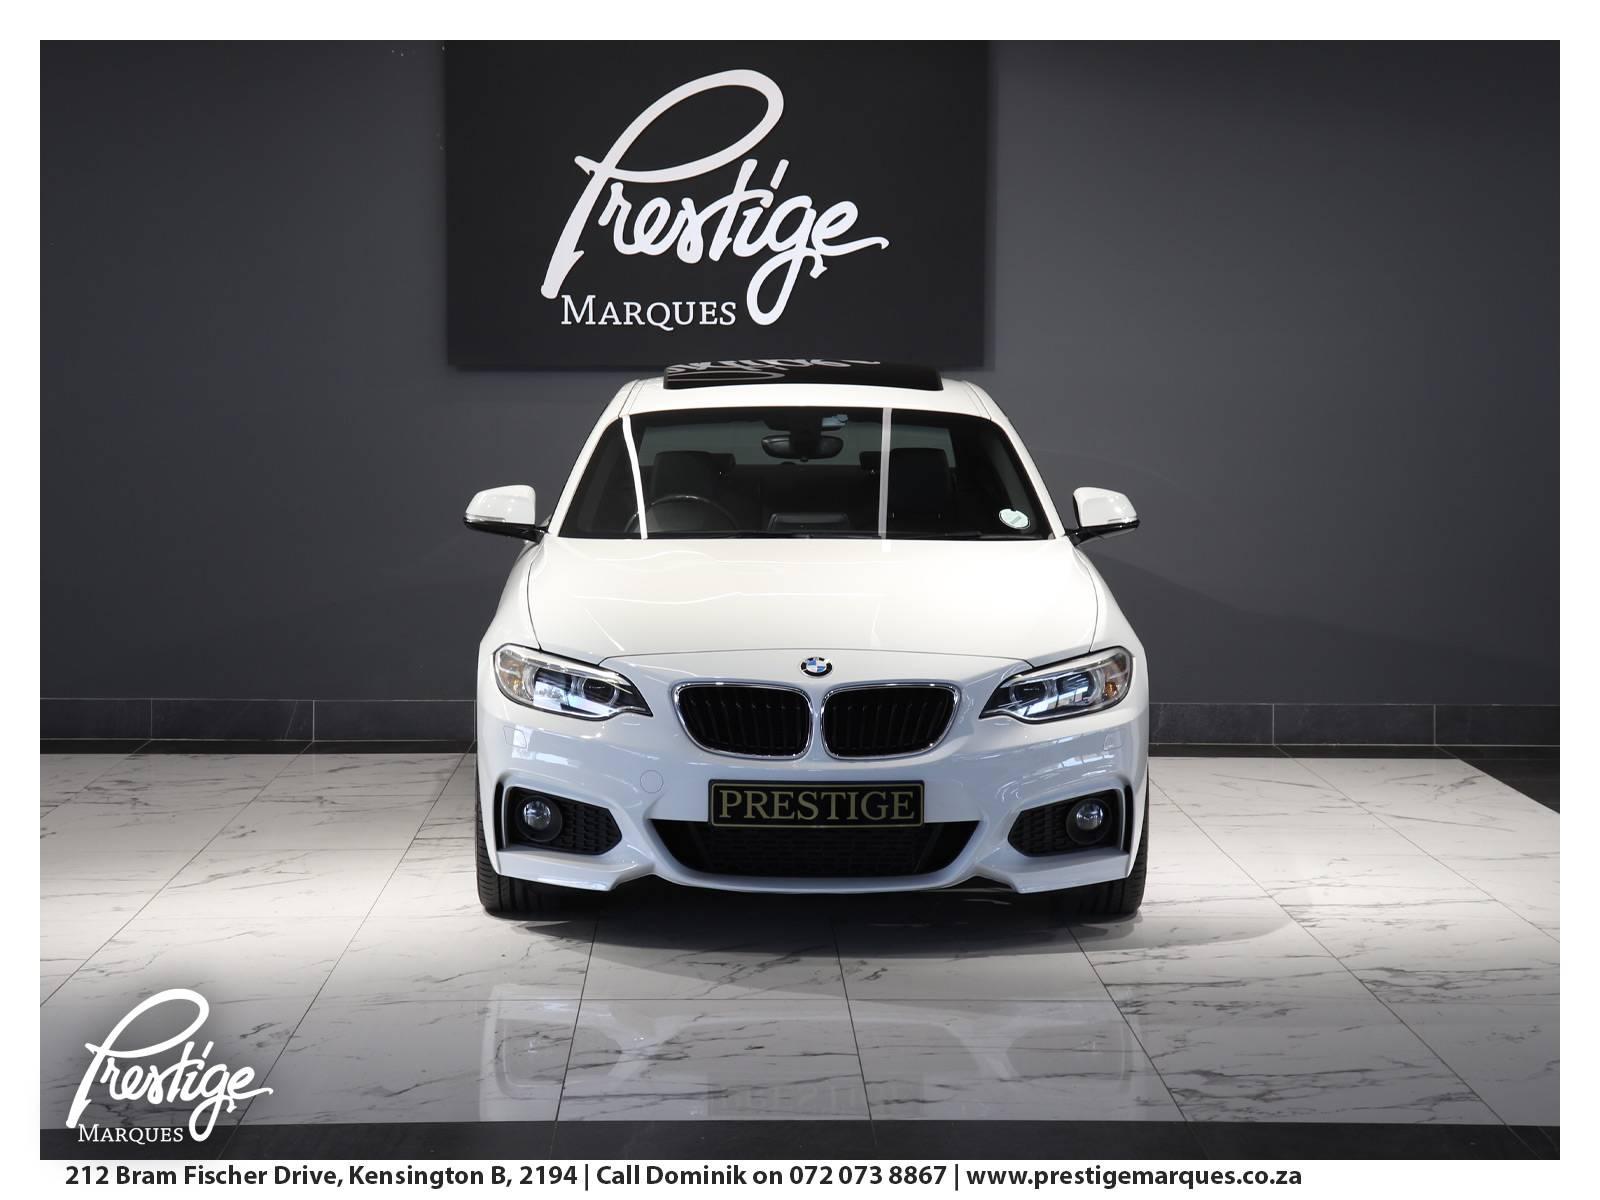 2015_BMW-2 series-220d-Prestige-Marques-Randburg-Sandton-7